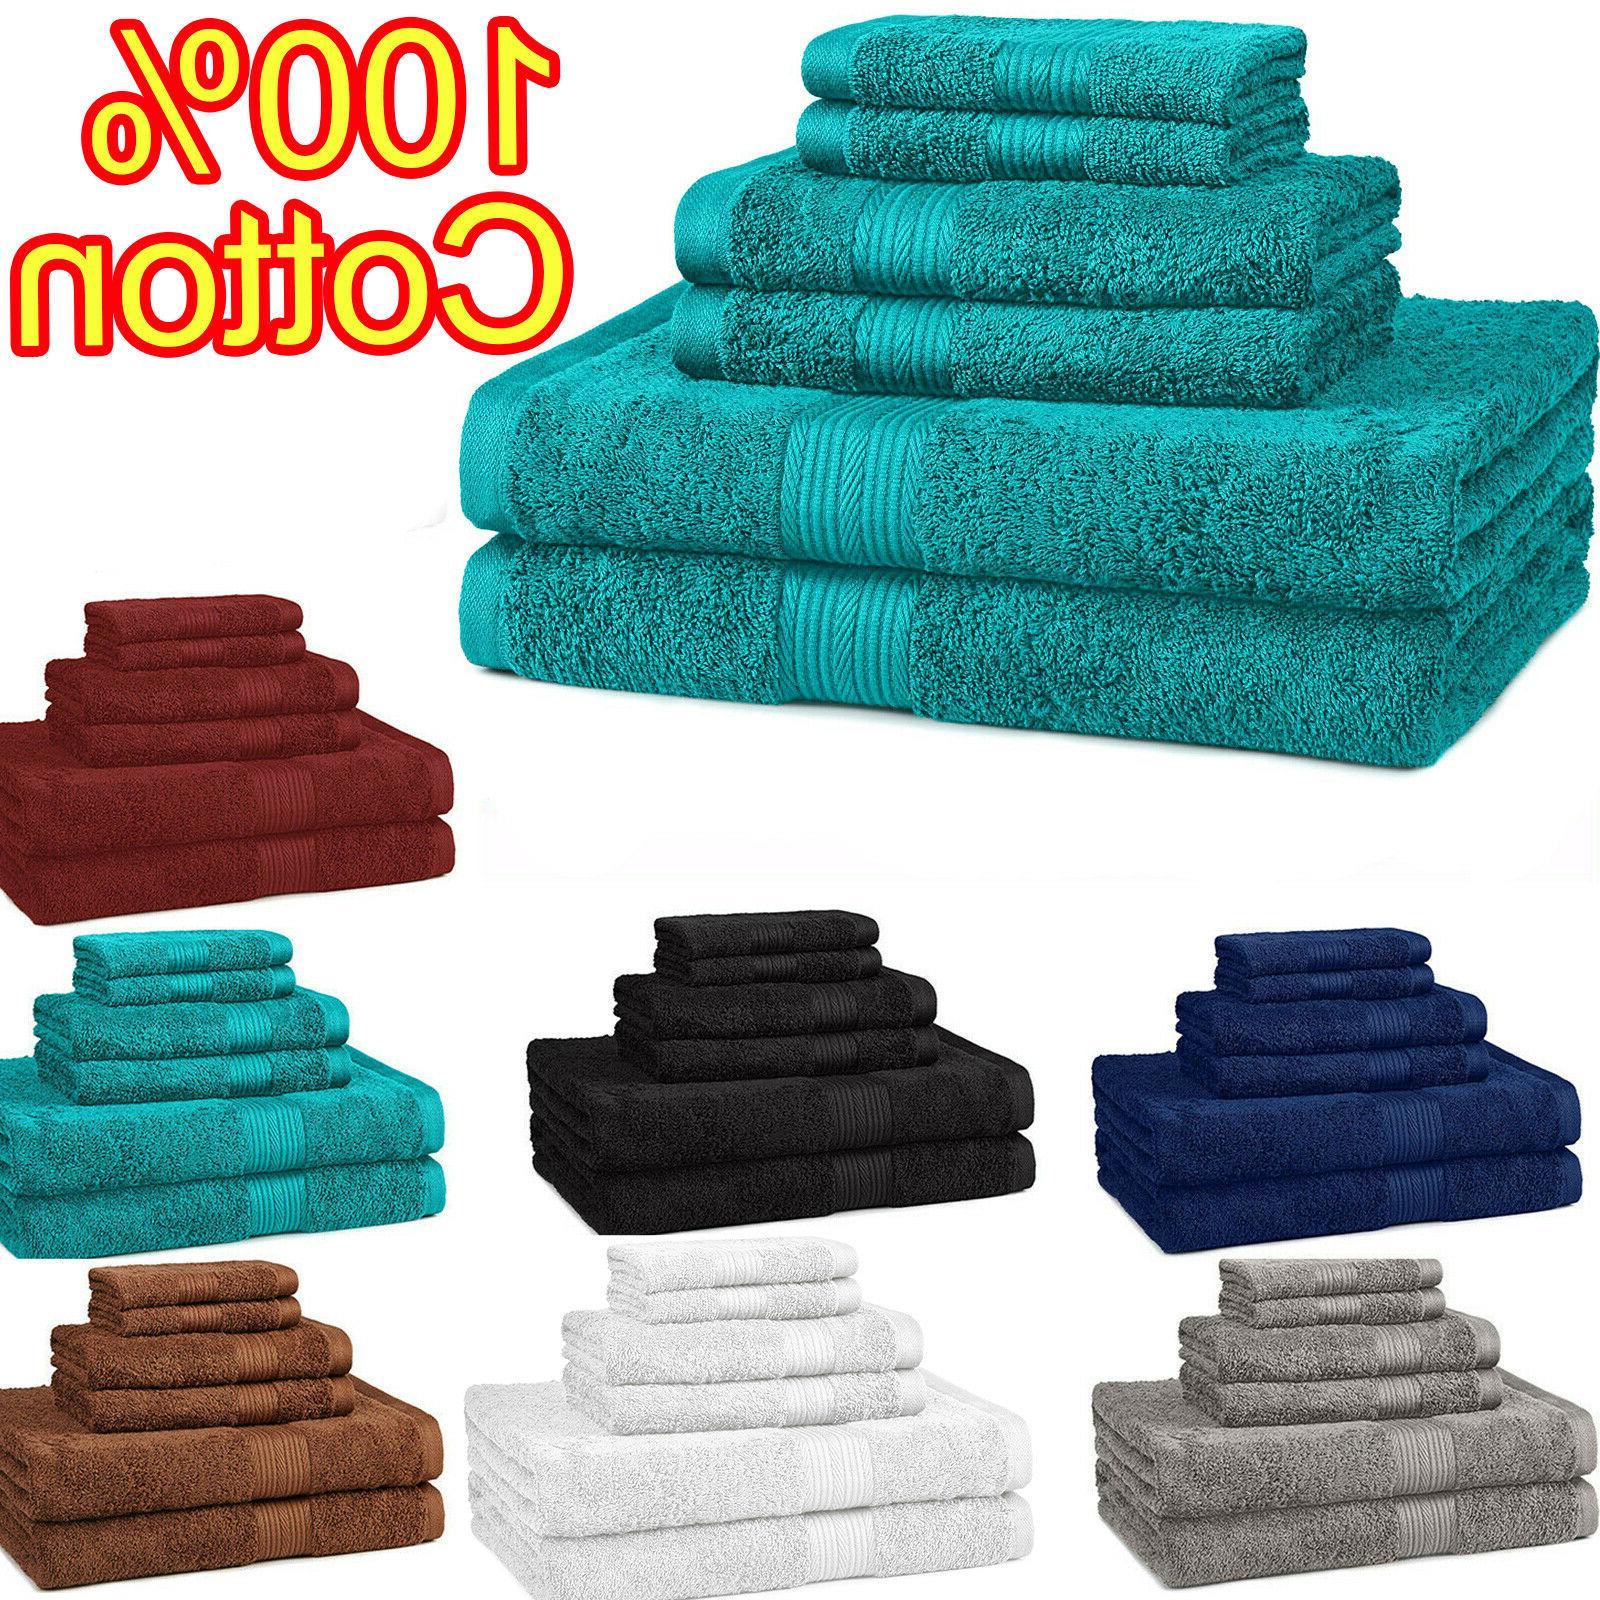 New Bath Towel 6 Piece Set 100% Cotton Bathroom Towels Washc